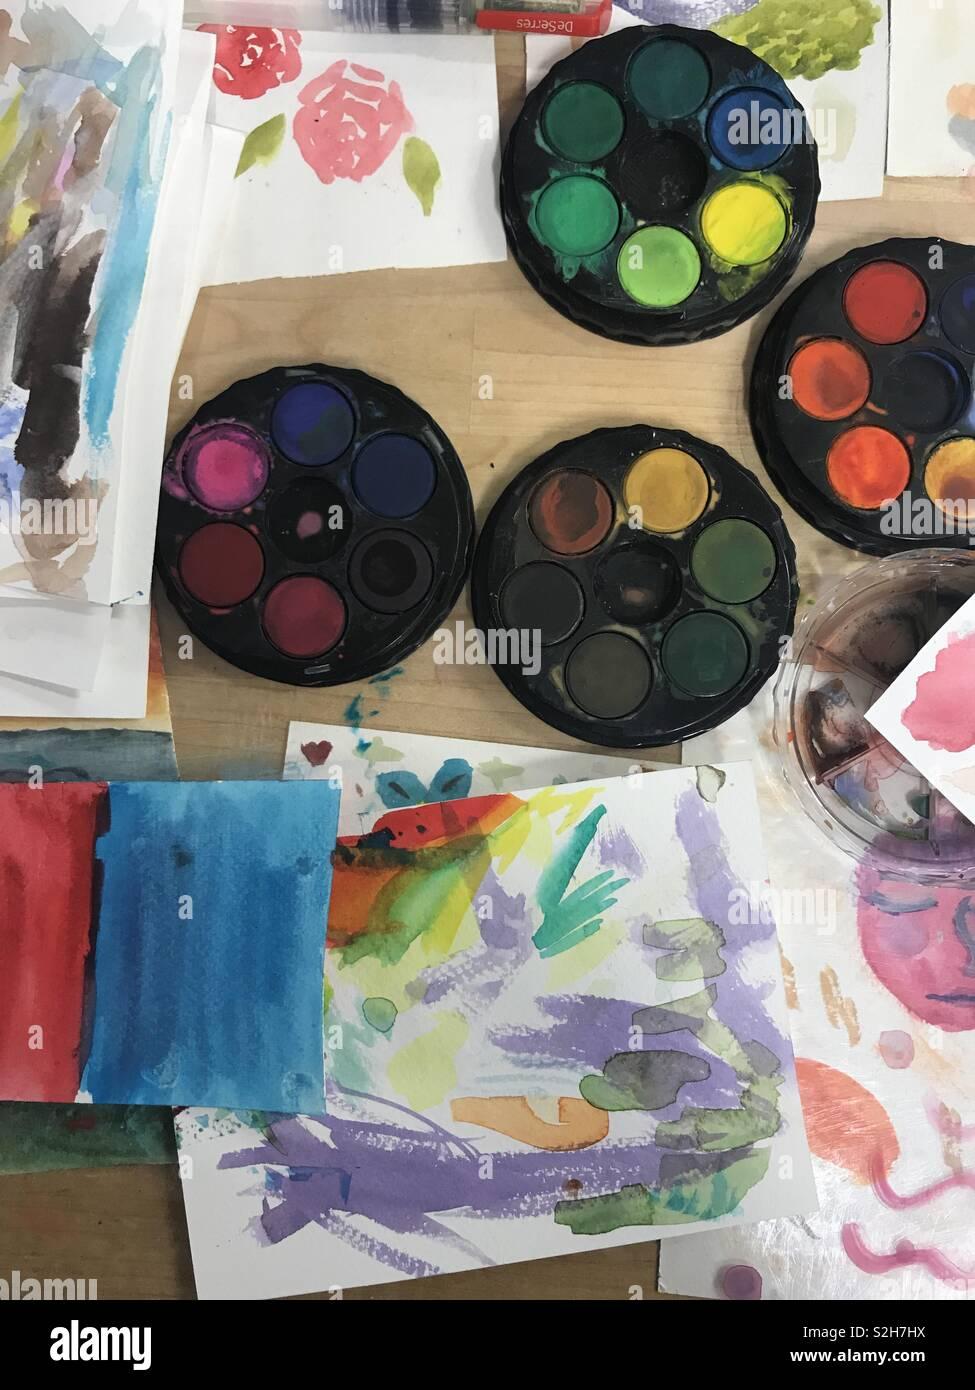 Art store - Stock Image